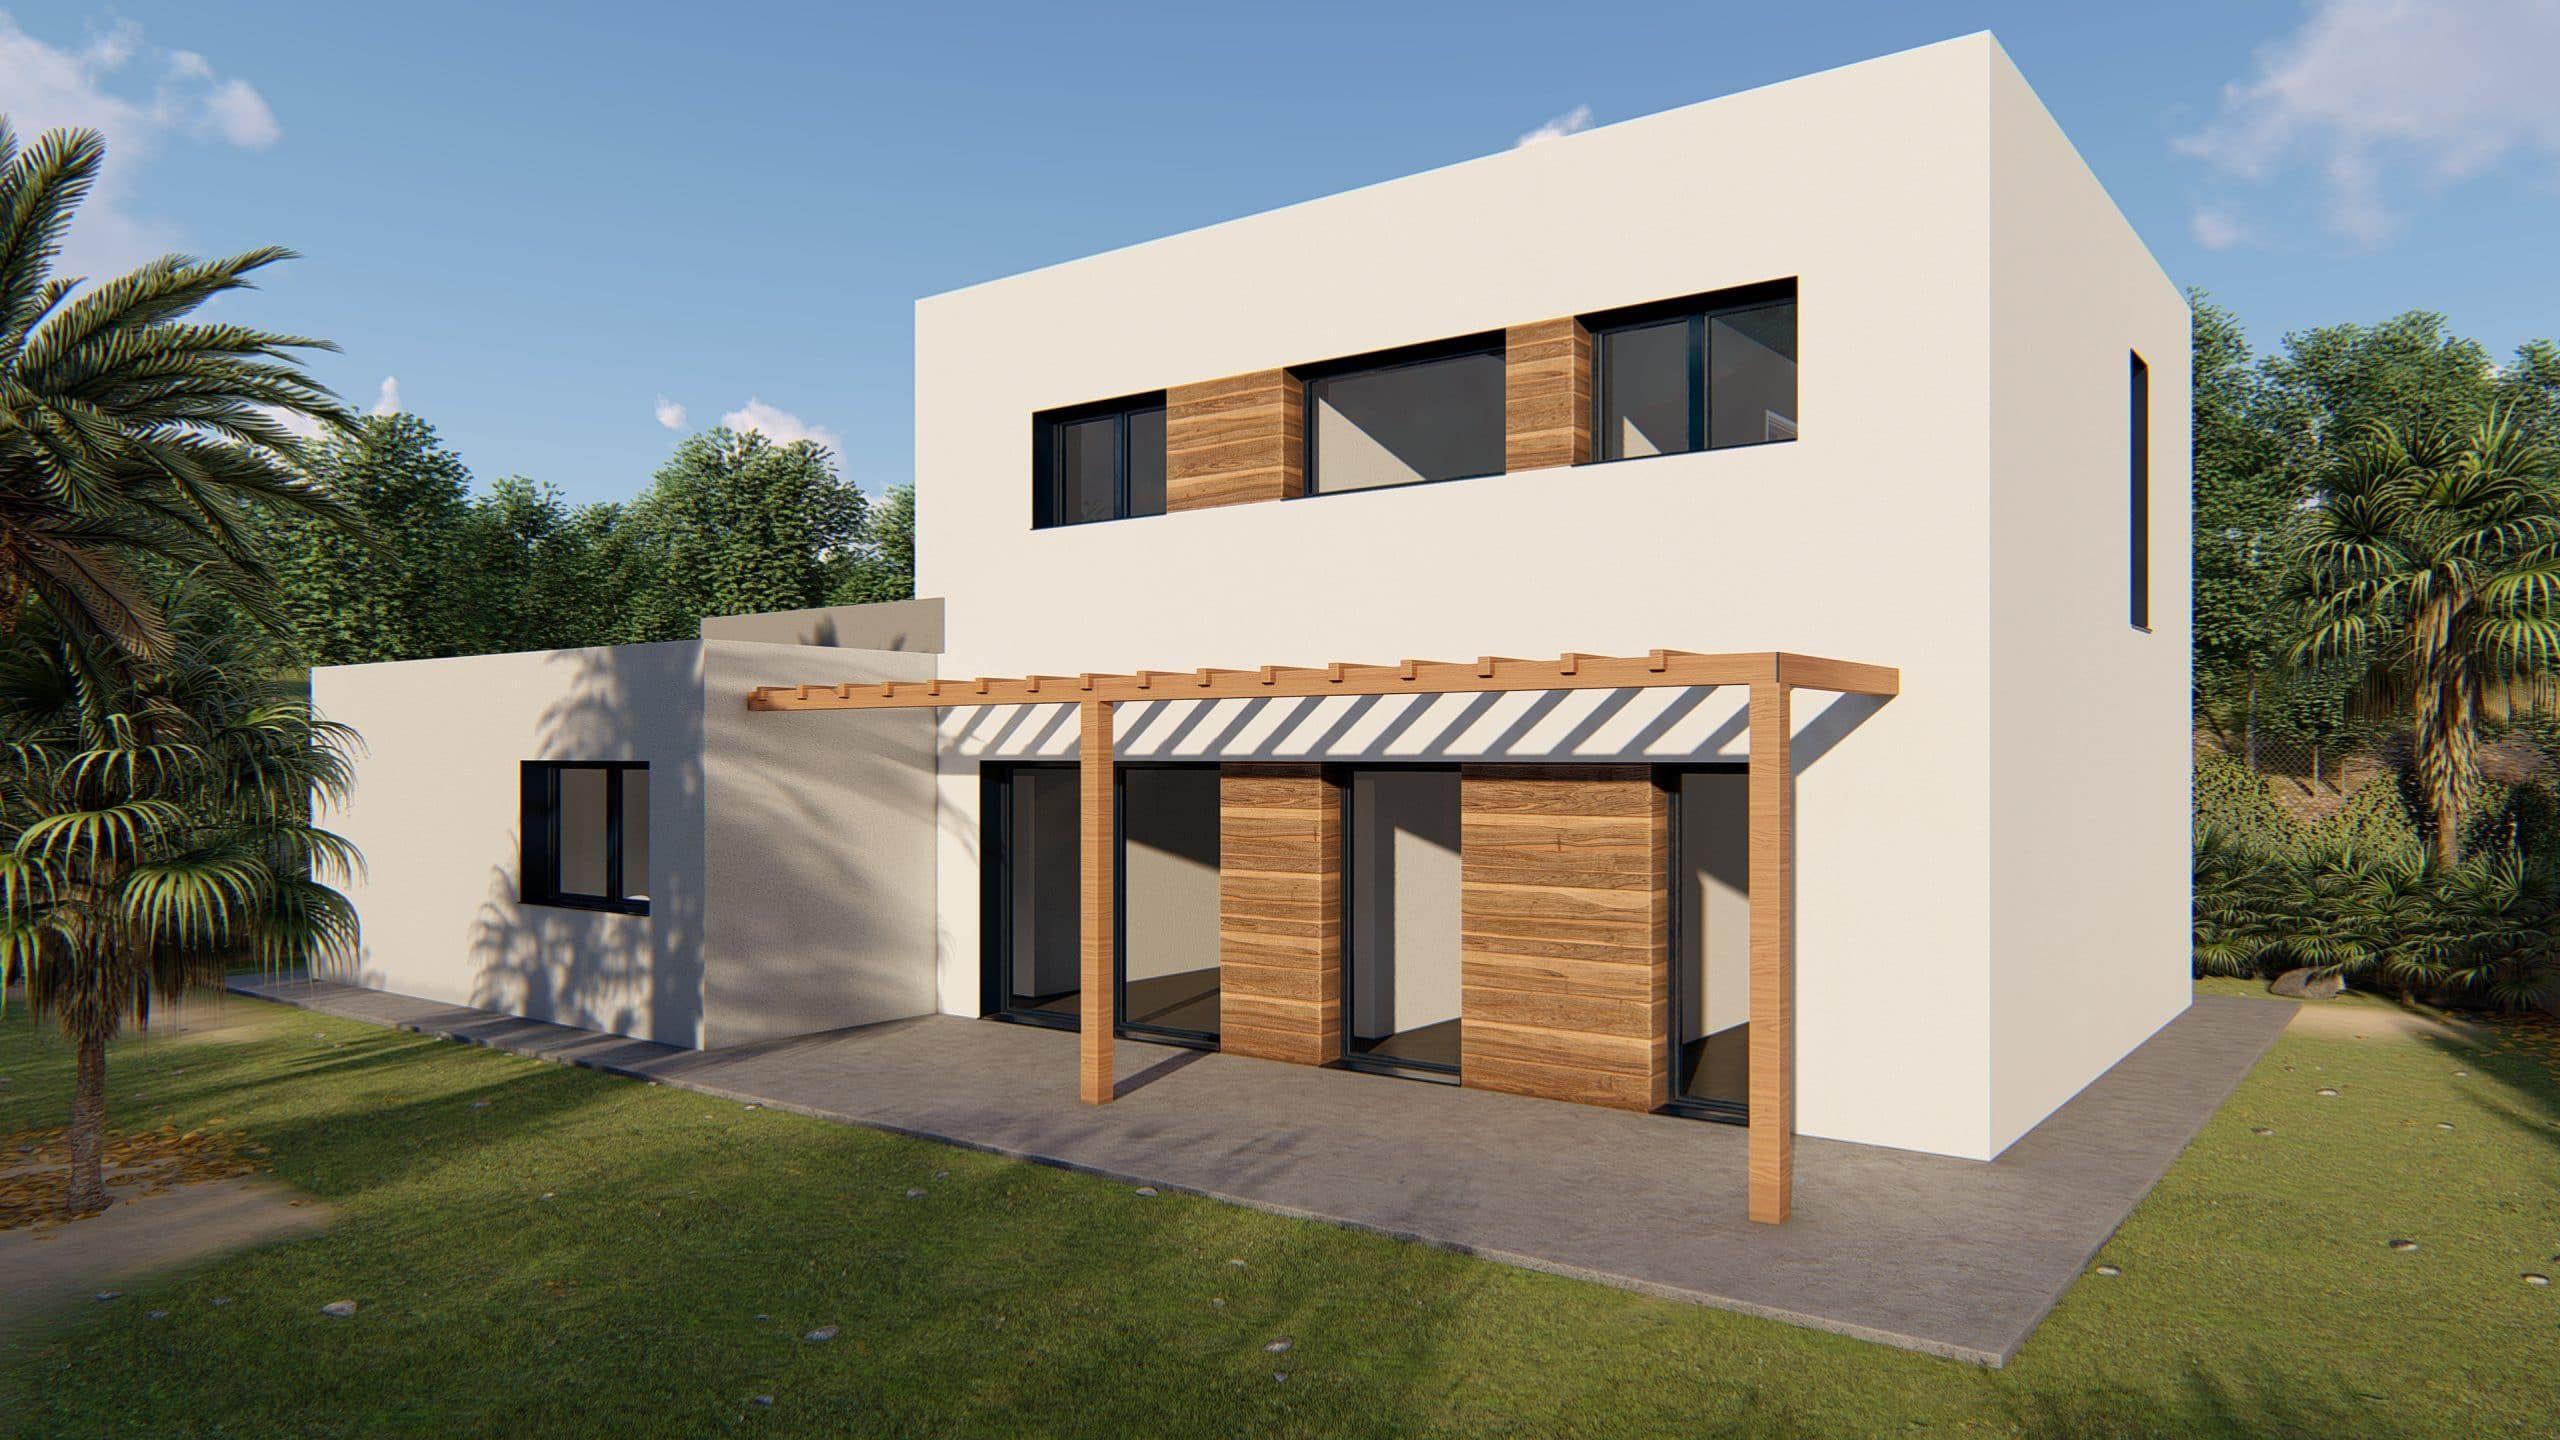 Casa prefabricada modelo Sant Cugat - façana